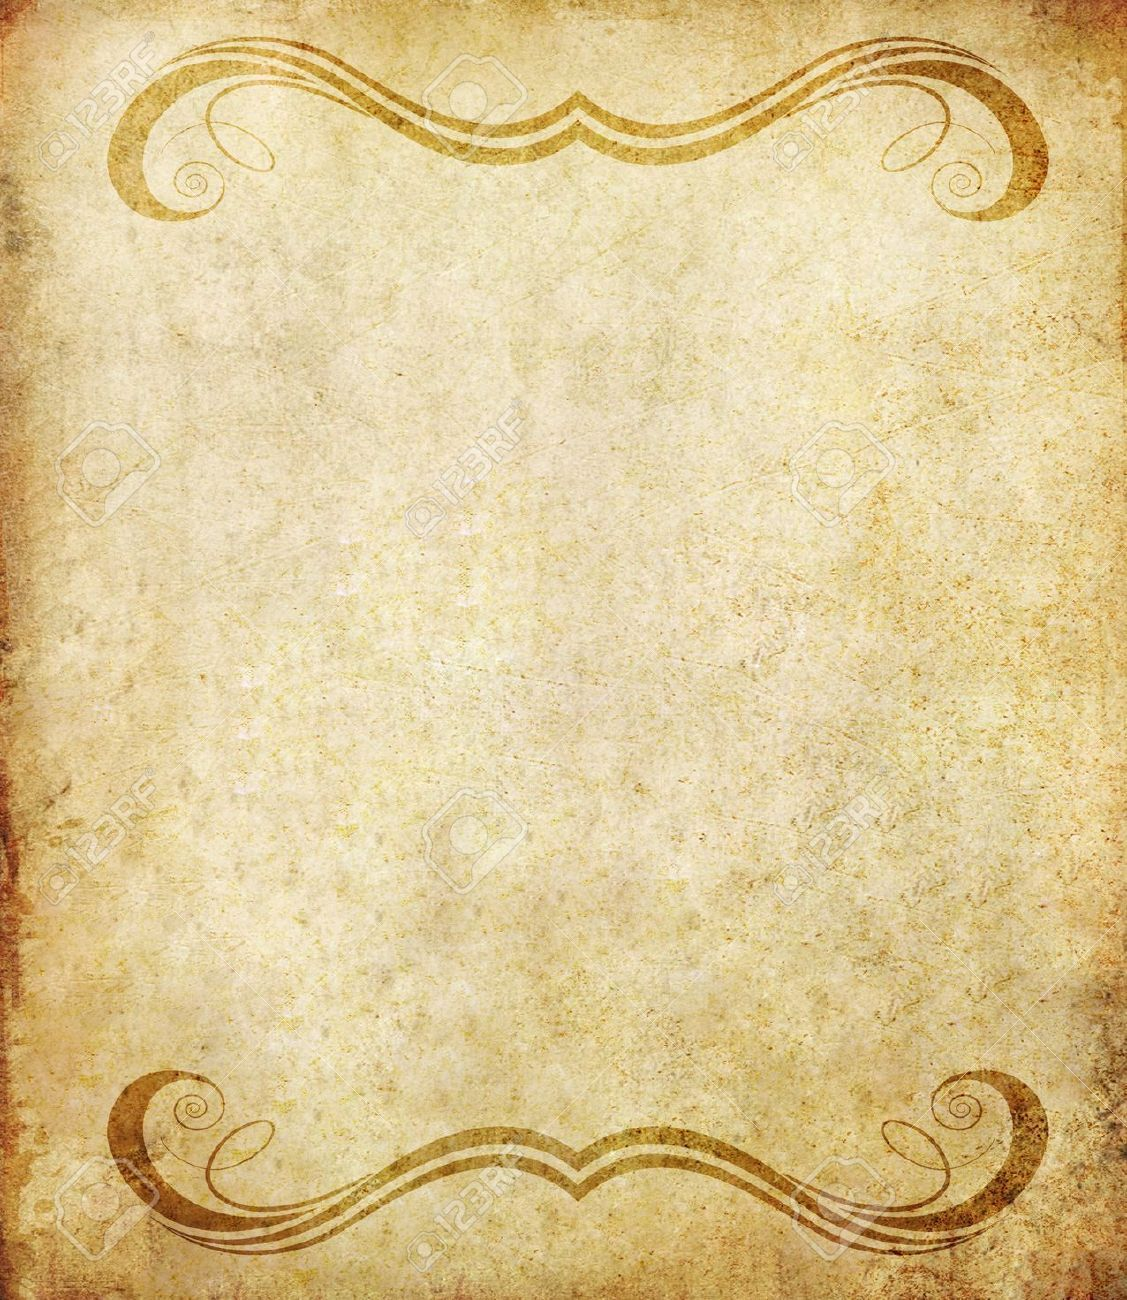 30 Old Paper Textures - t 23